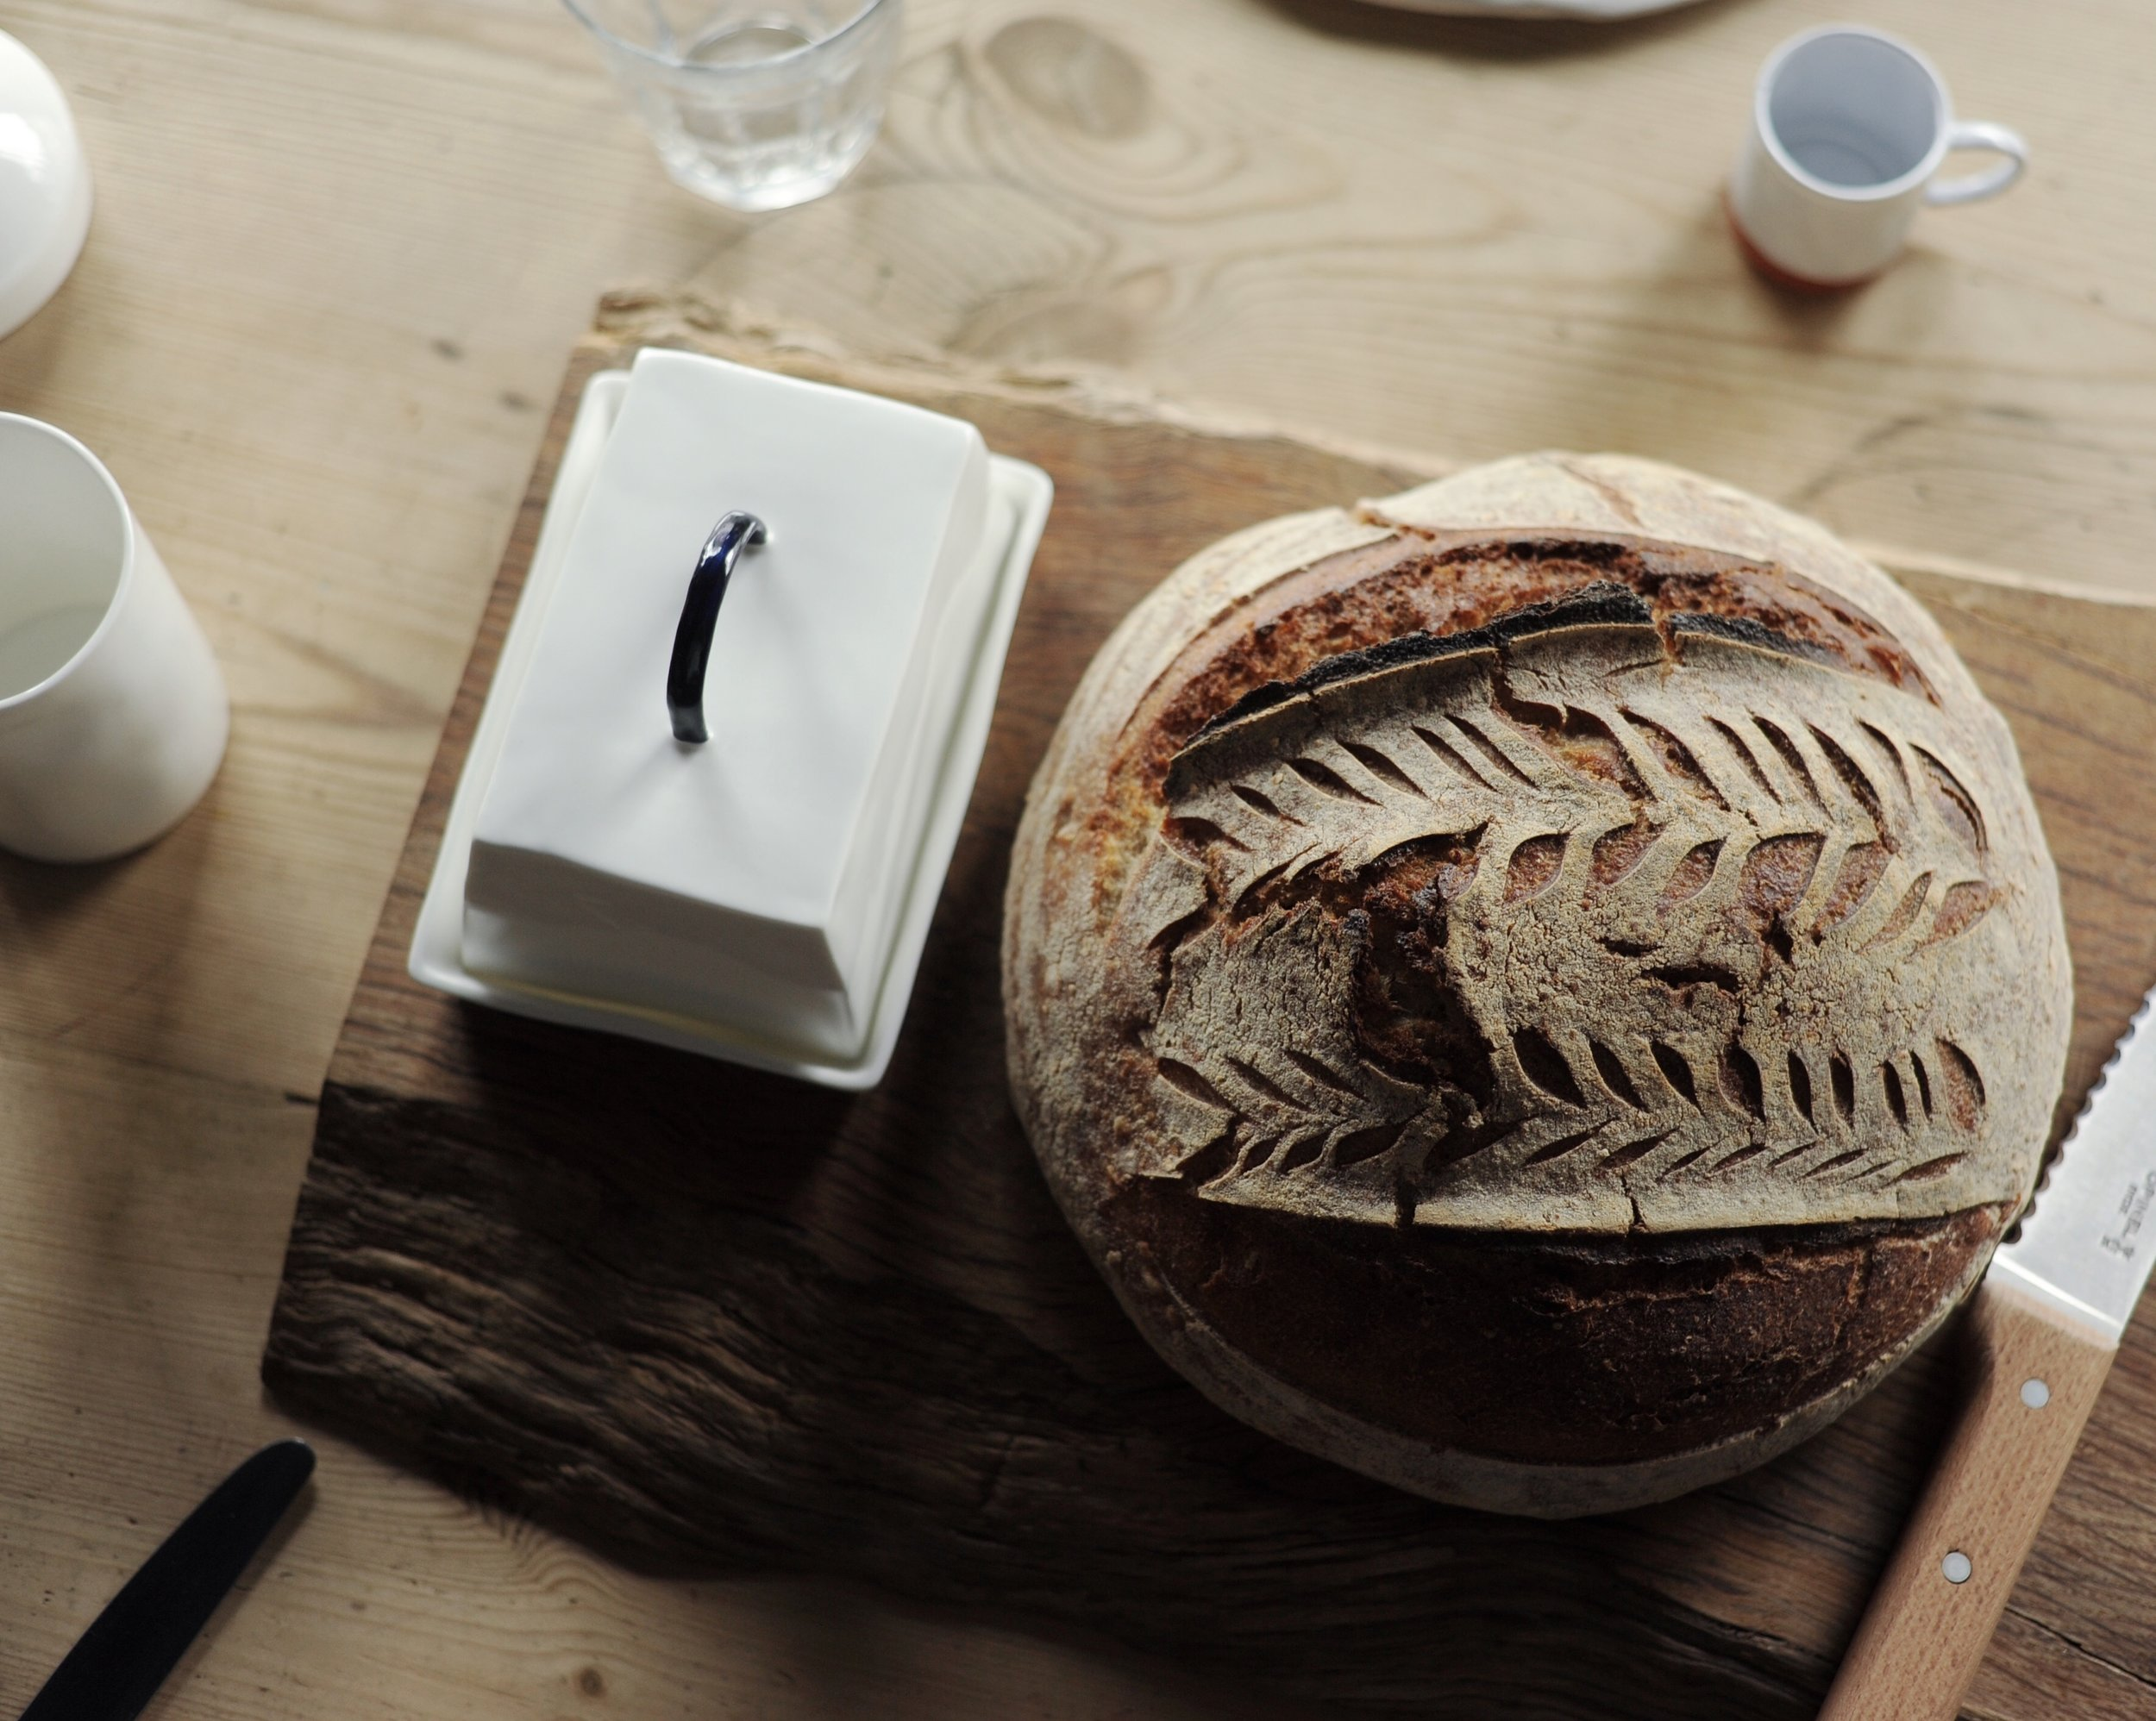 Feldspar homewares, fine bone china butter dish on wooden chopping board, with sourdough loaf.